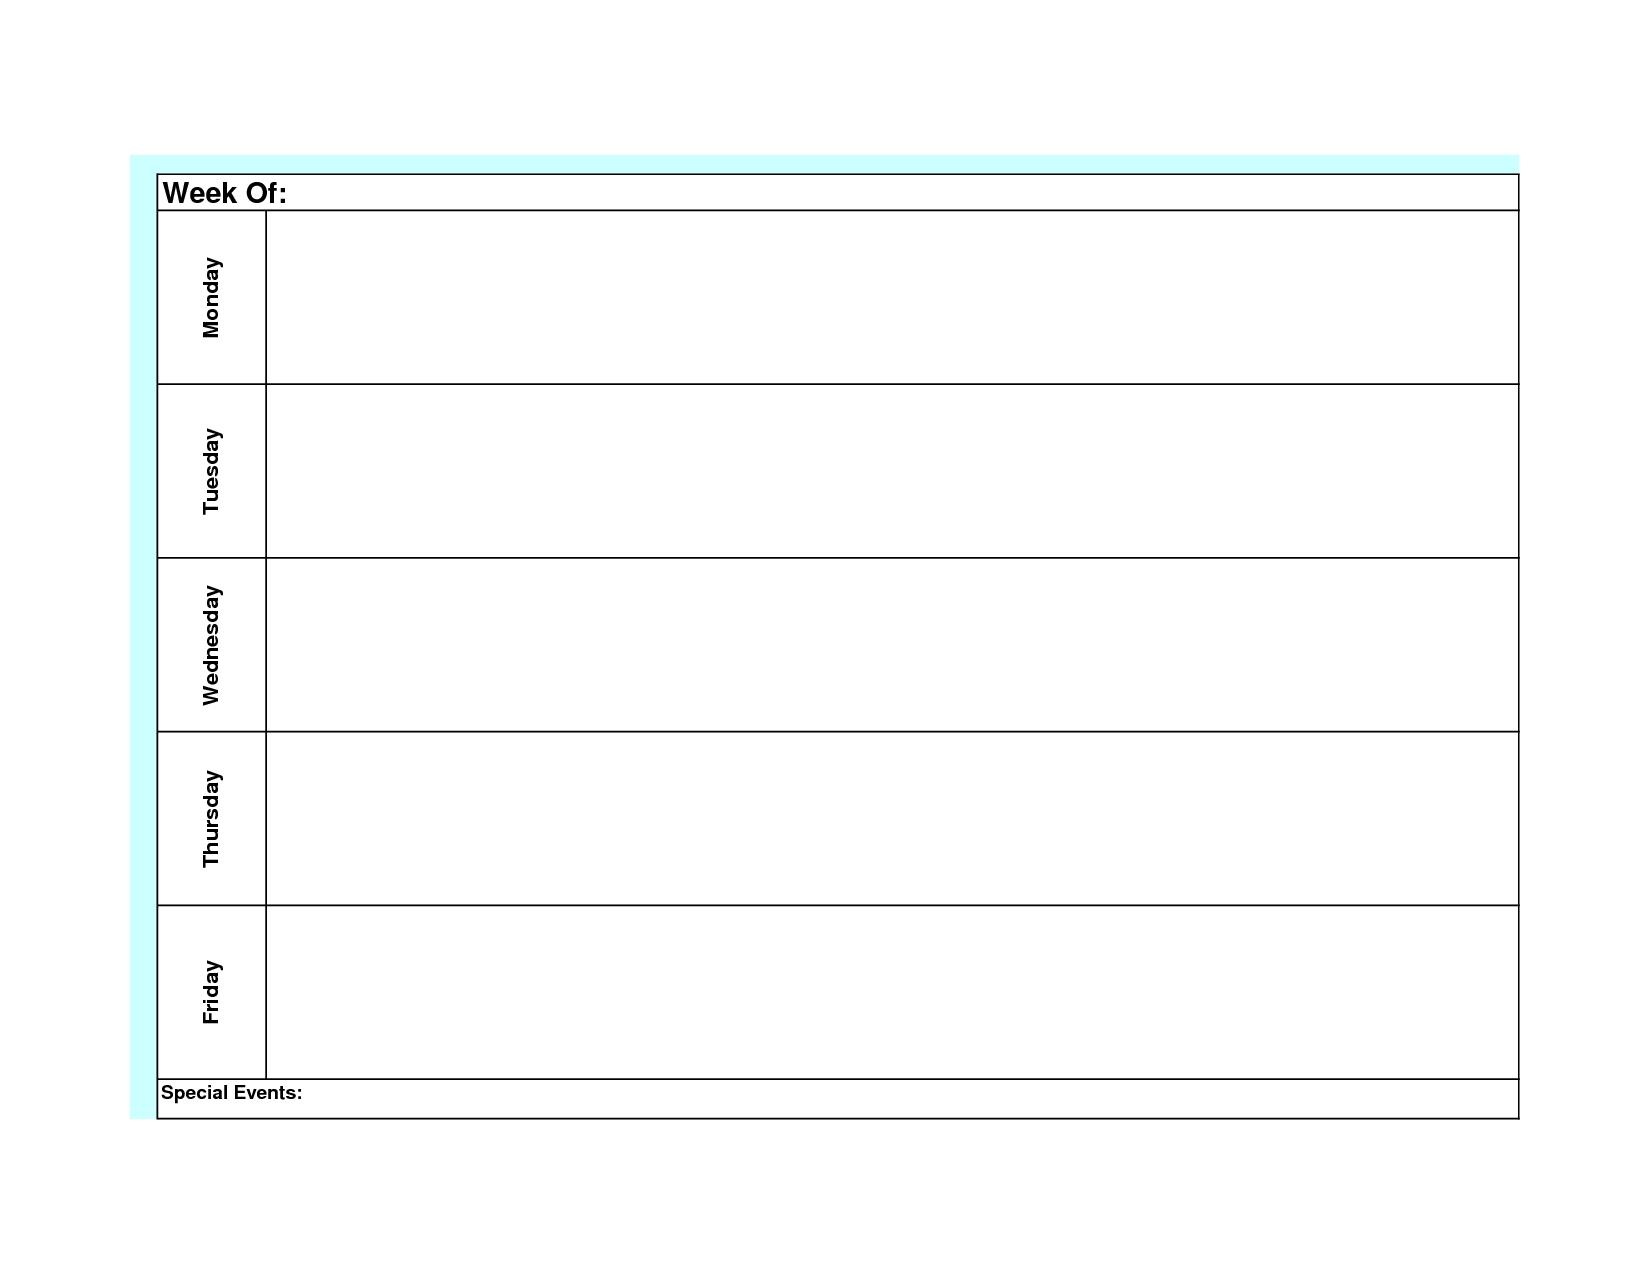 Blank Weekly Calendar Template Monday Friday | Weekly intended for Weekly Calendar Monday Through Friday